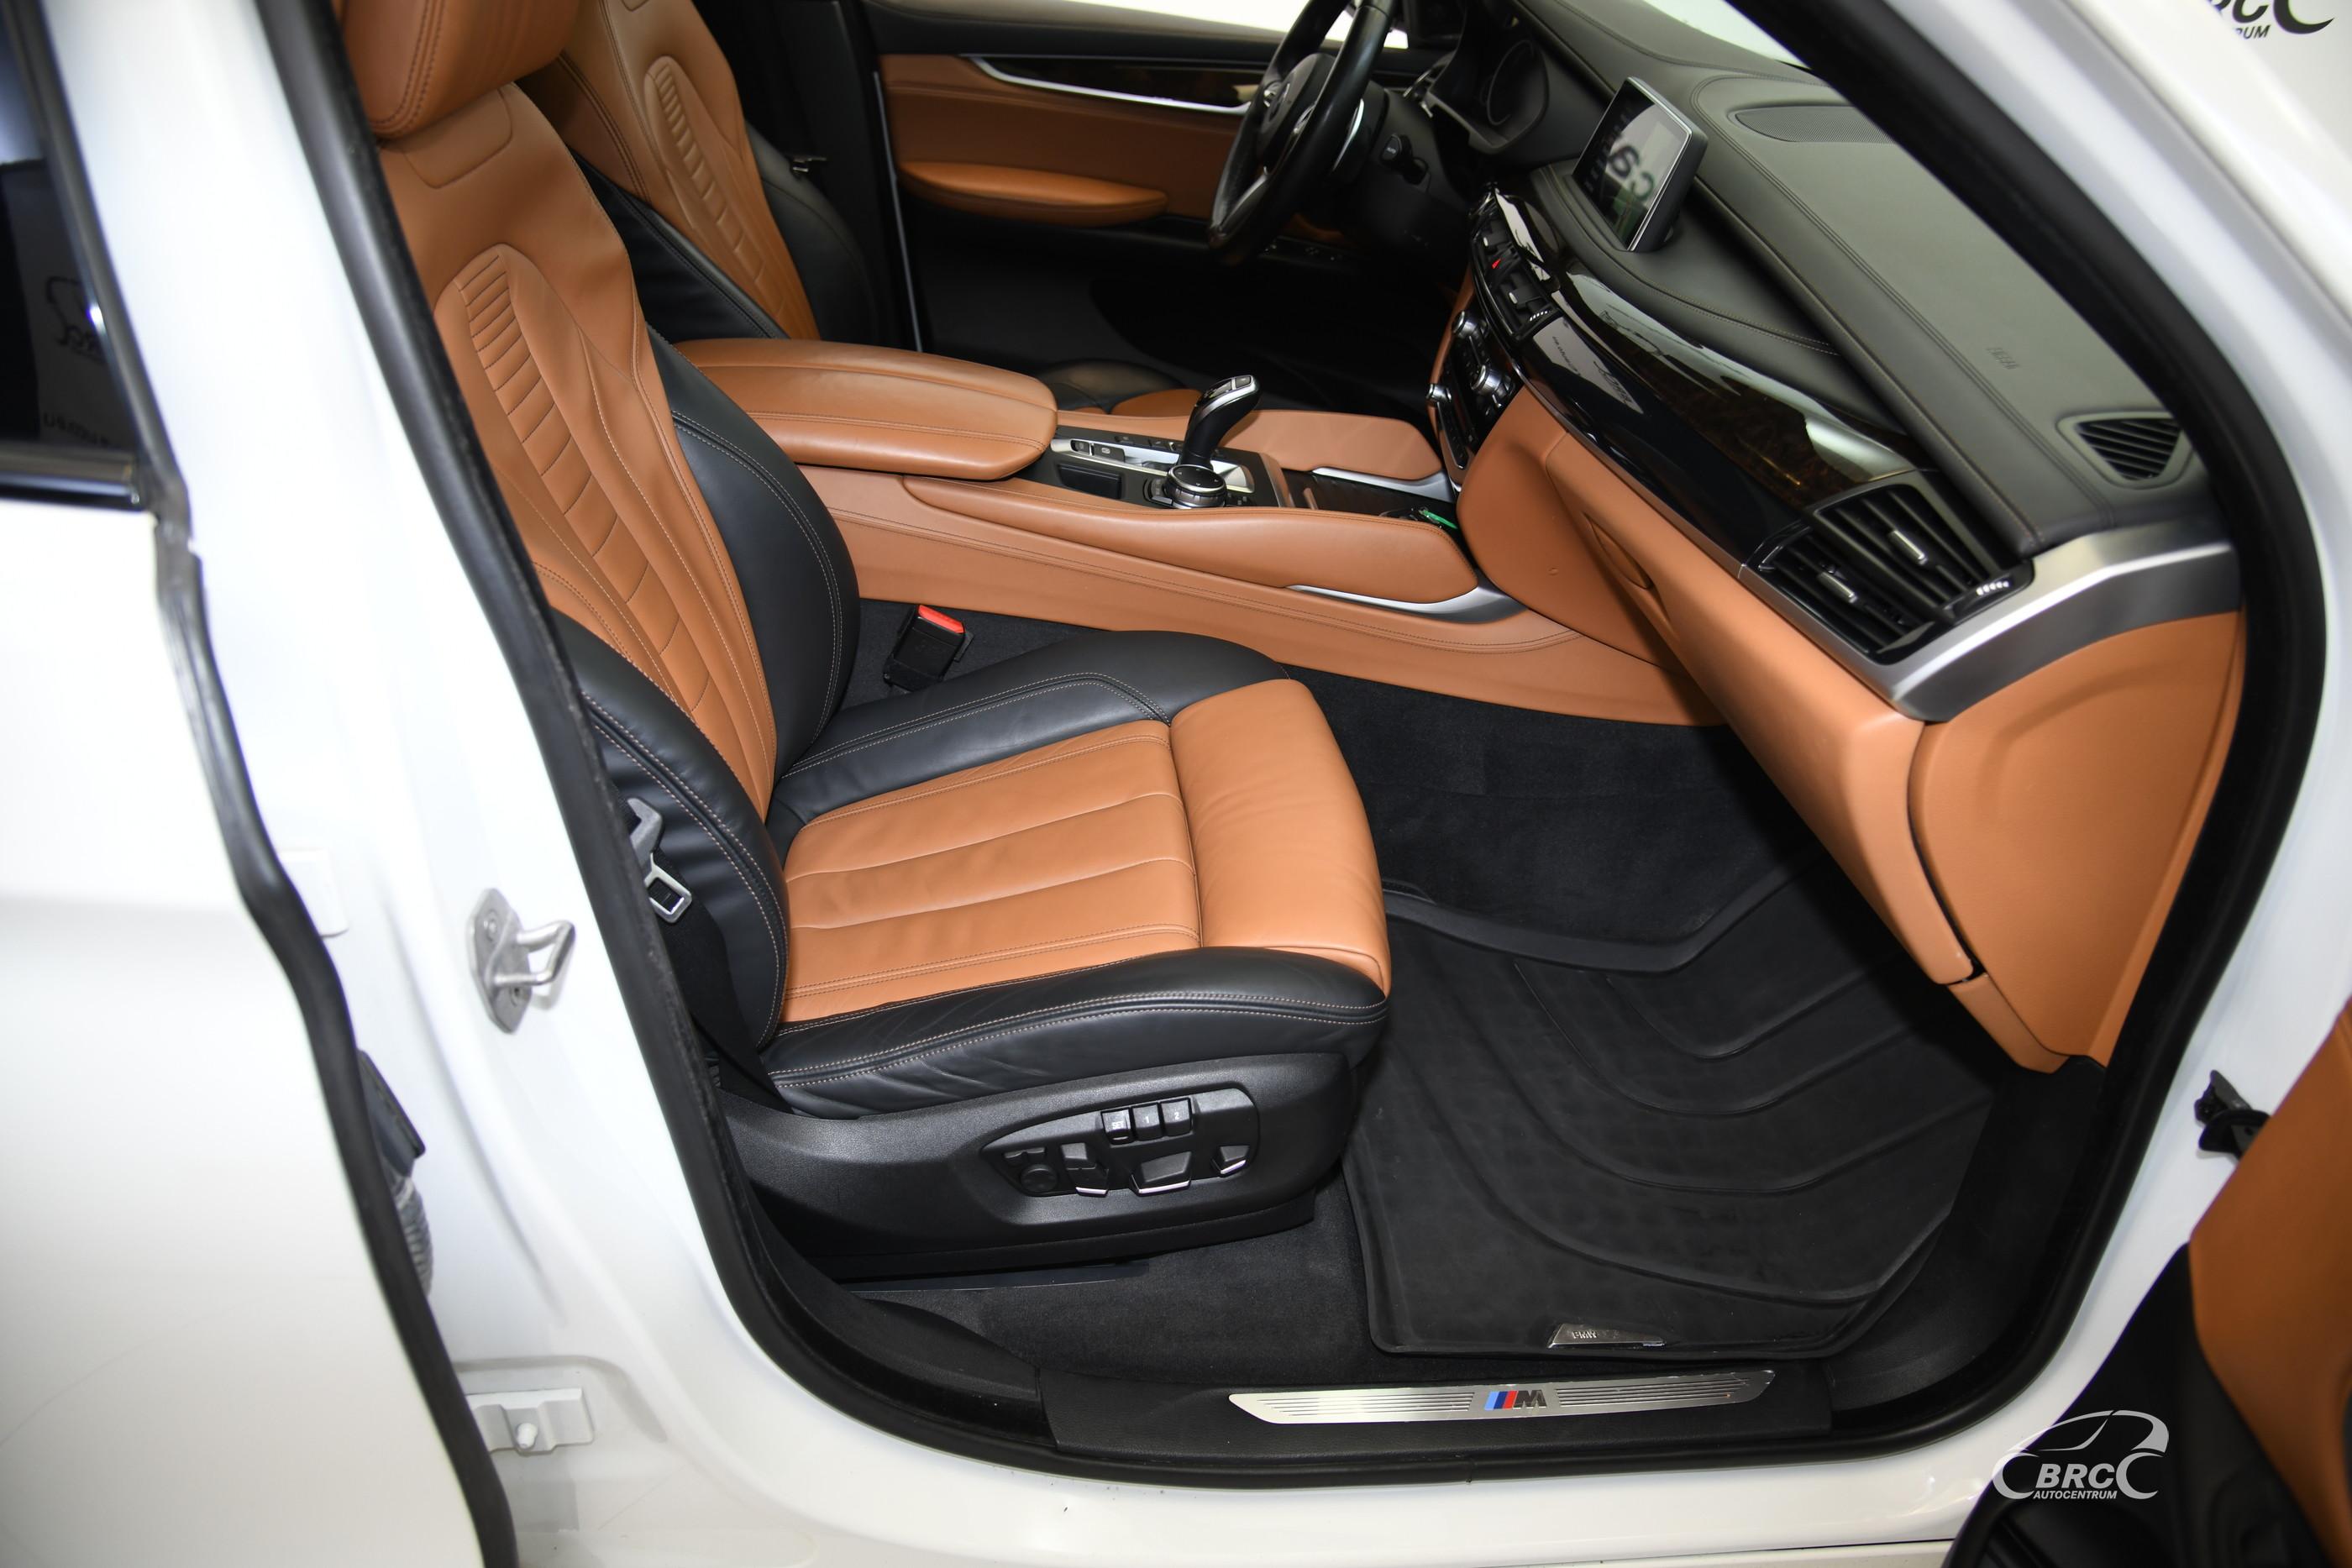 BMW X6 Xdrive 35i Automatas M-packet